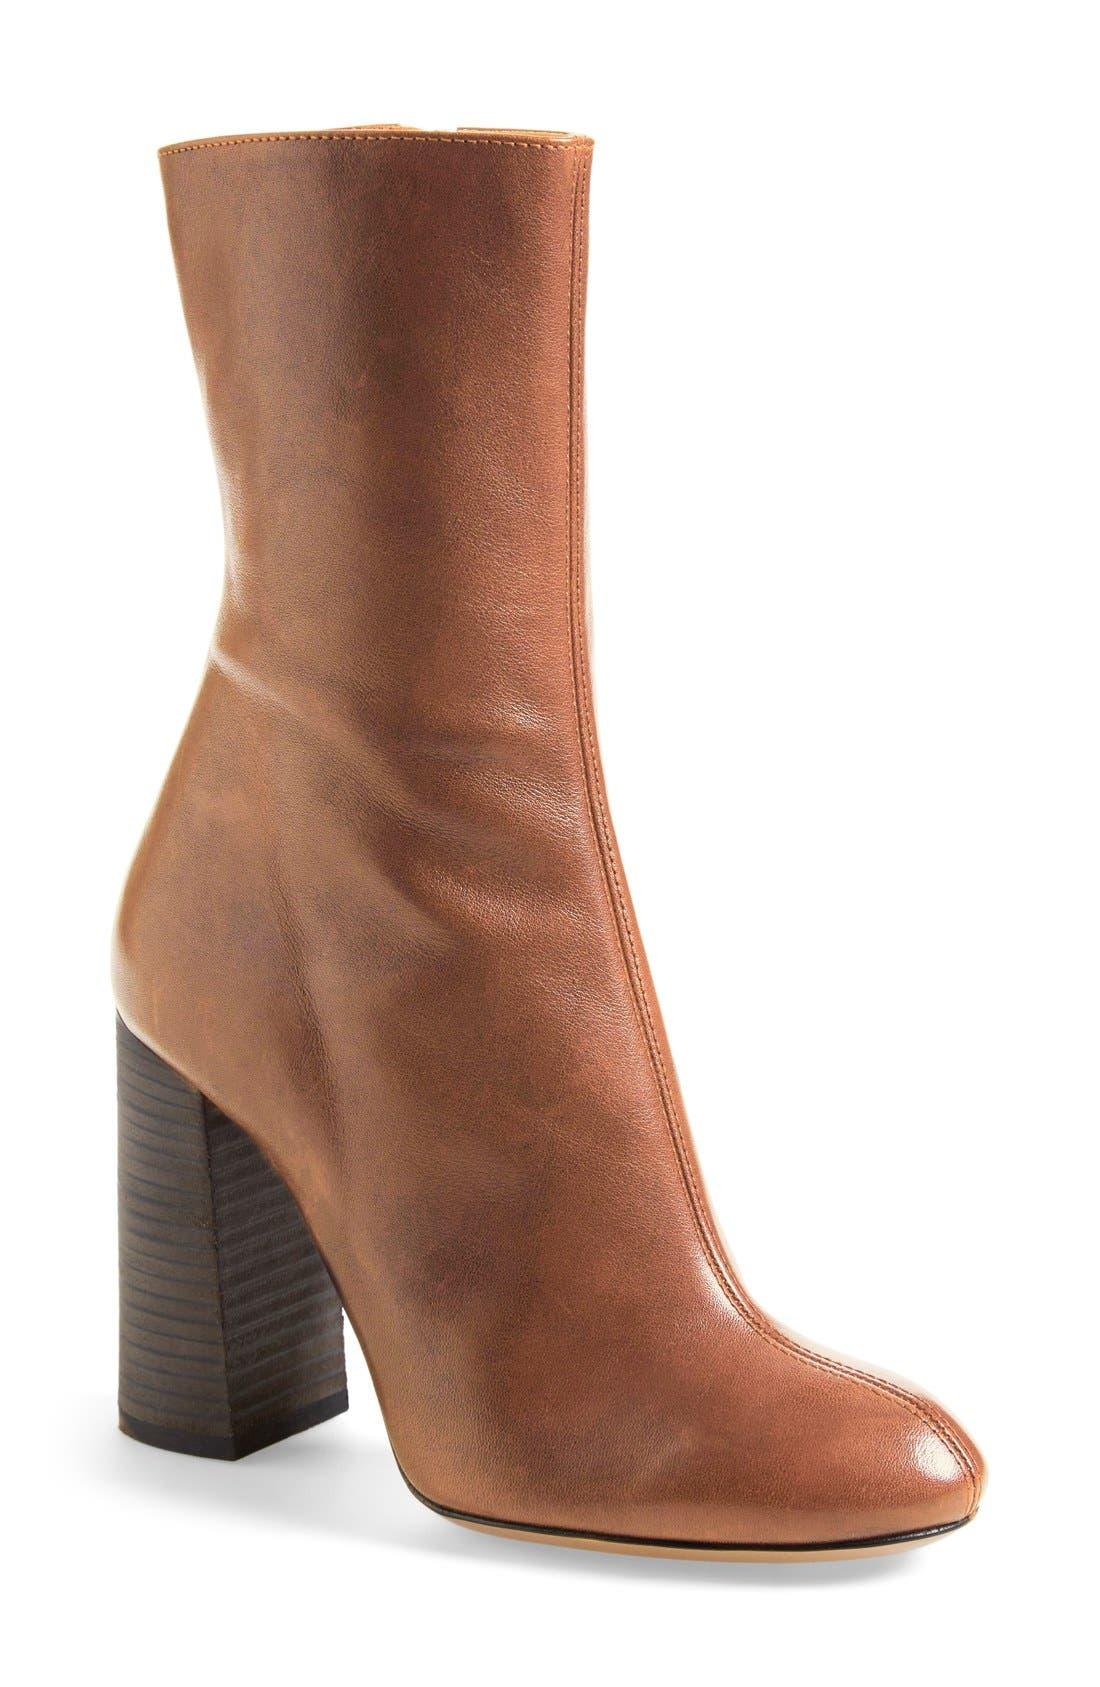 Main Image - Chloé 'Harper' Boot (Women)